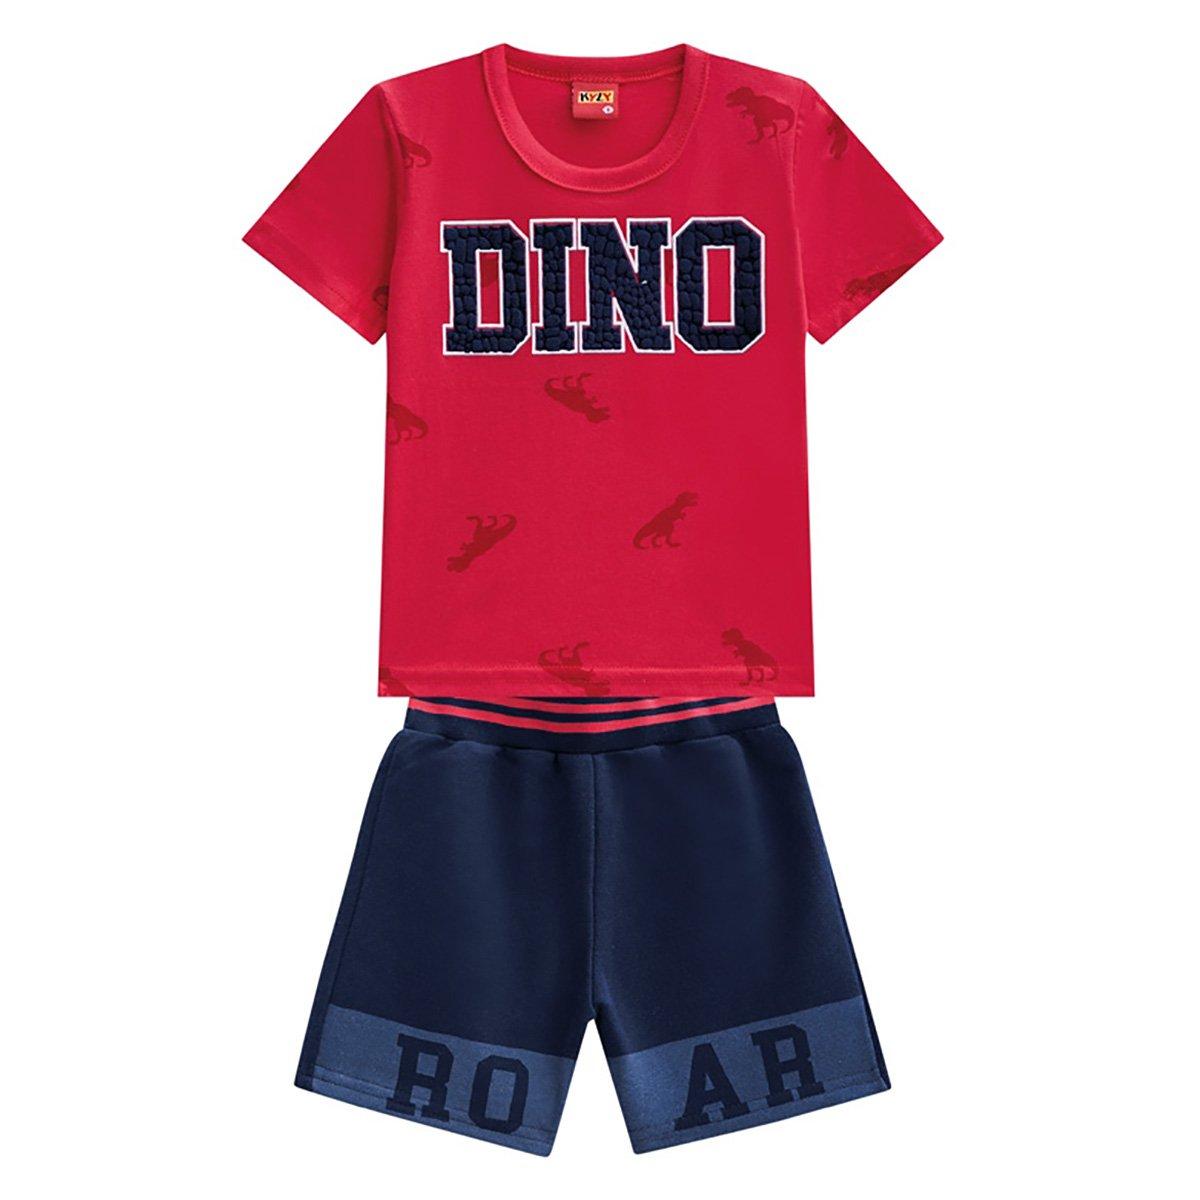 Conjunto Infantil Moletom Kyly Camiseta E Bermuda Dino Masculino